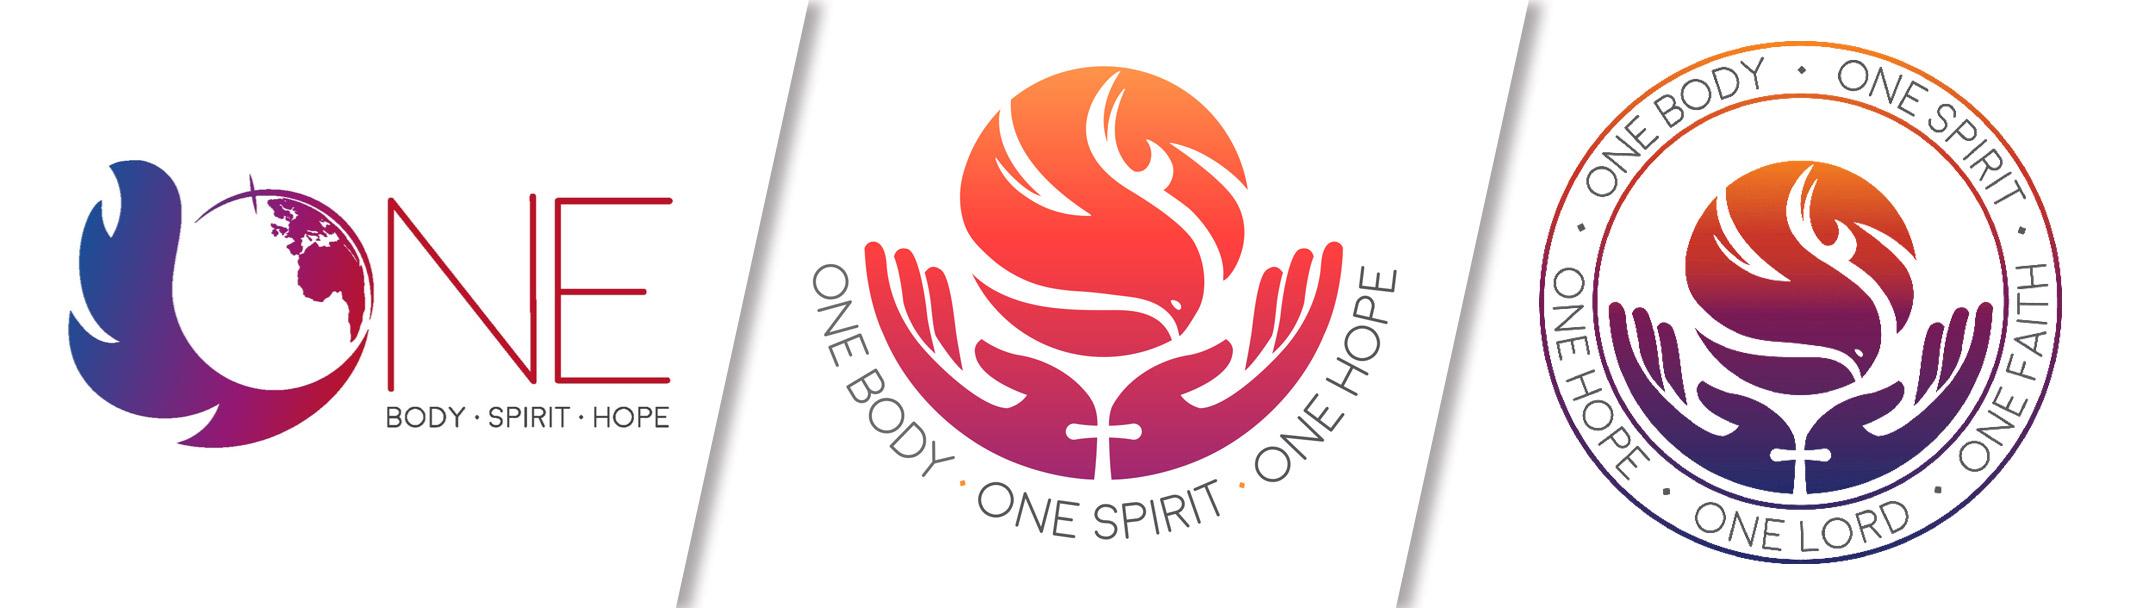 Church of the Nazarene logo development process